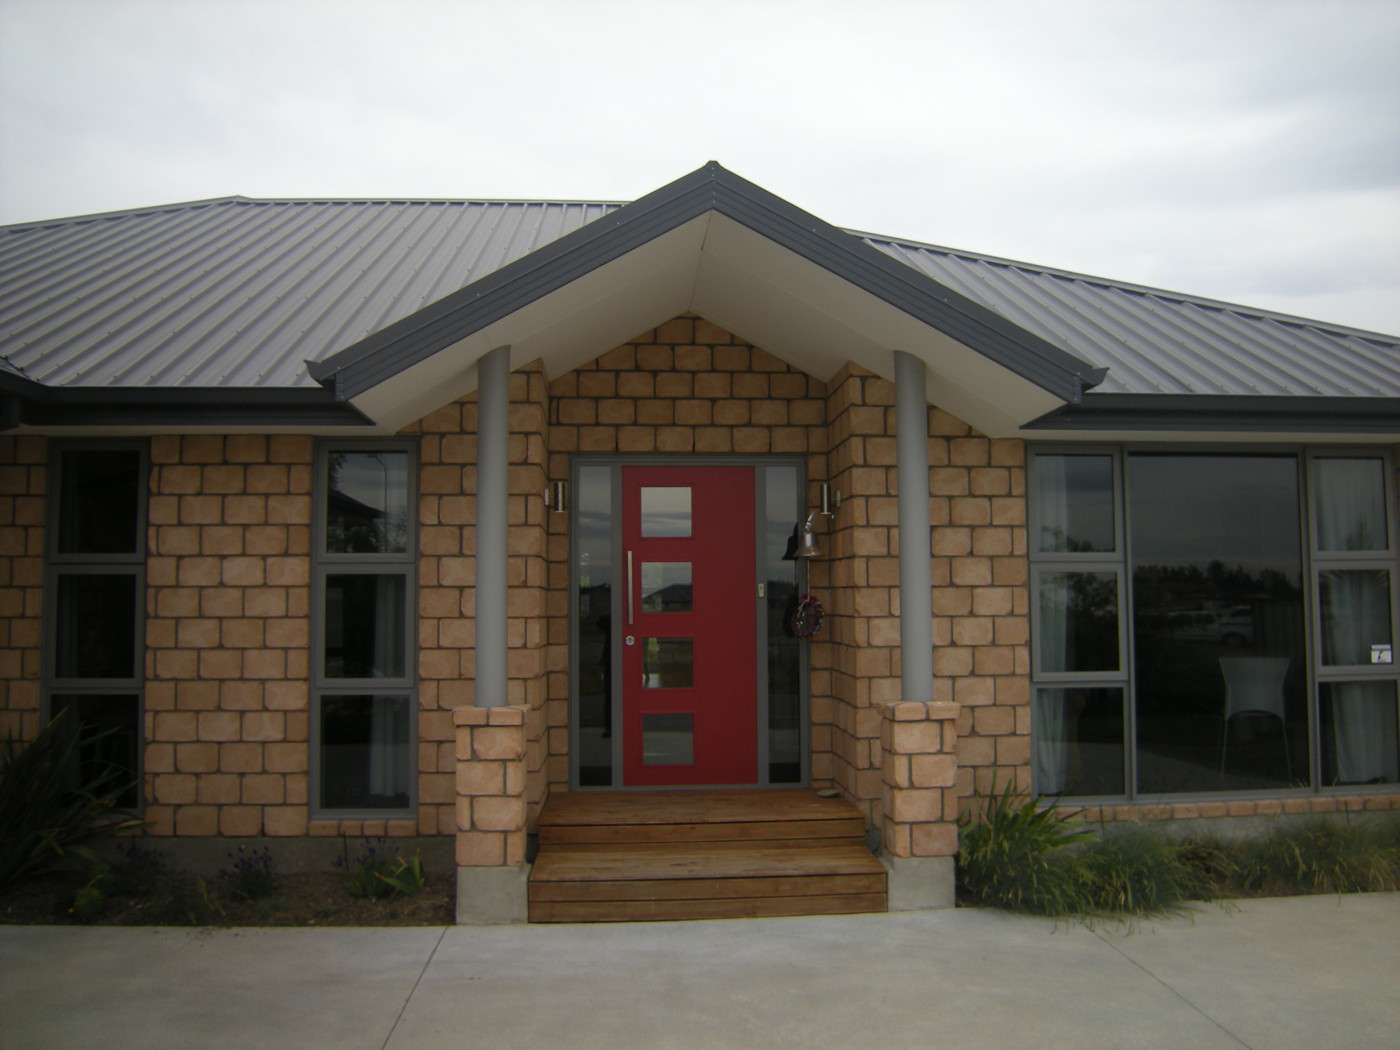 62 Rotherham Drive, WEST MELTON, Selwyn District 8051